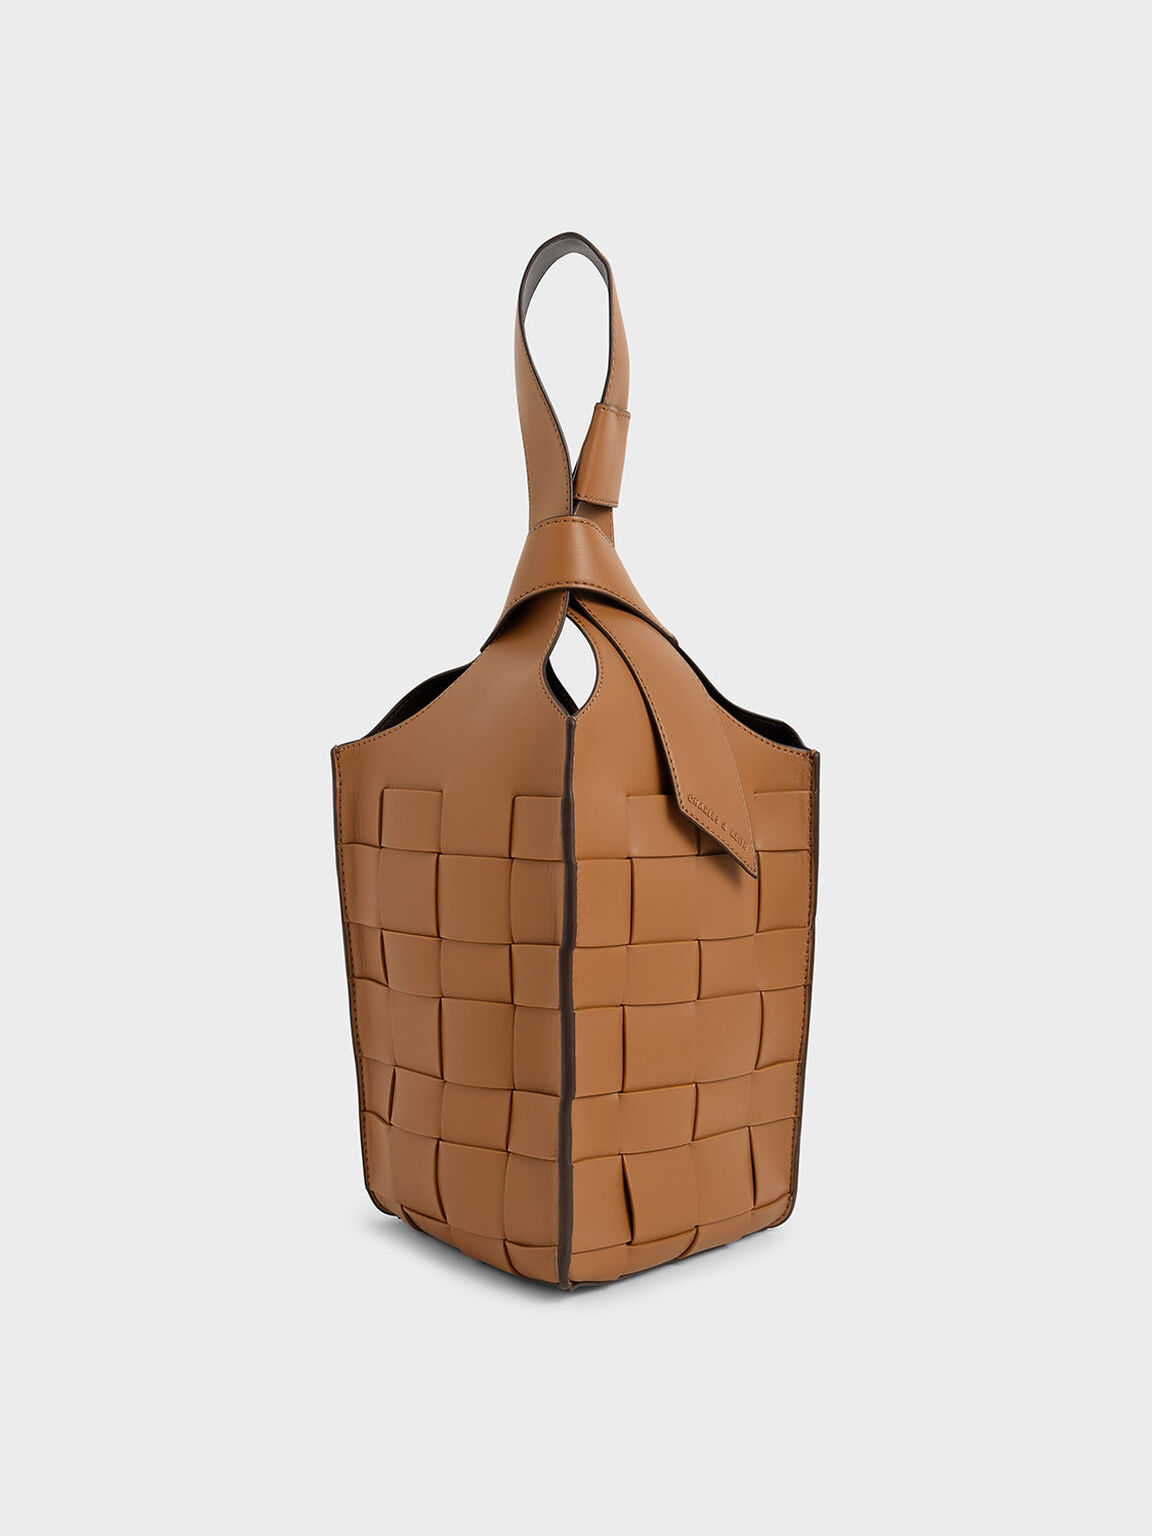 Woven Single Handle Bucket Bag, Camel, hi-res